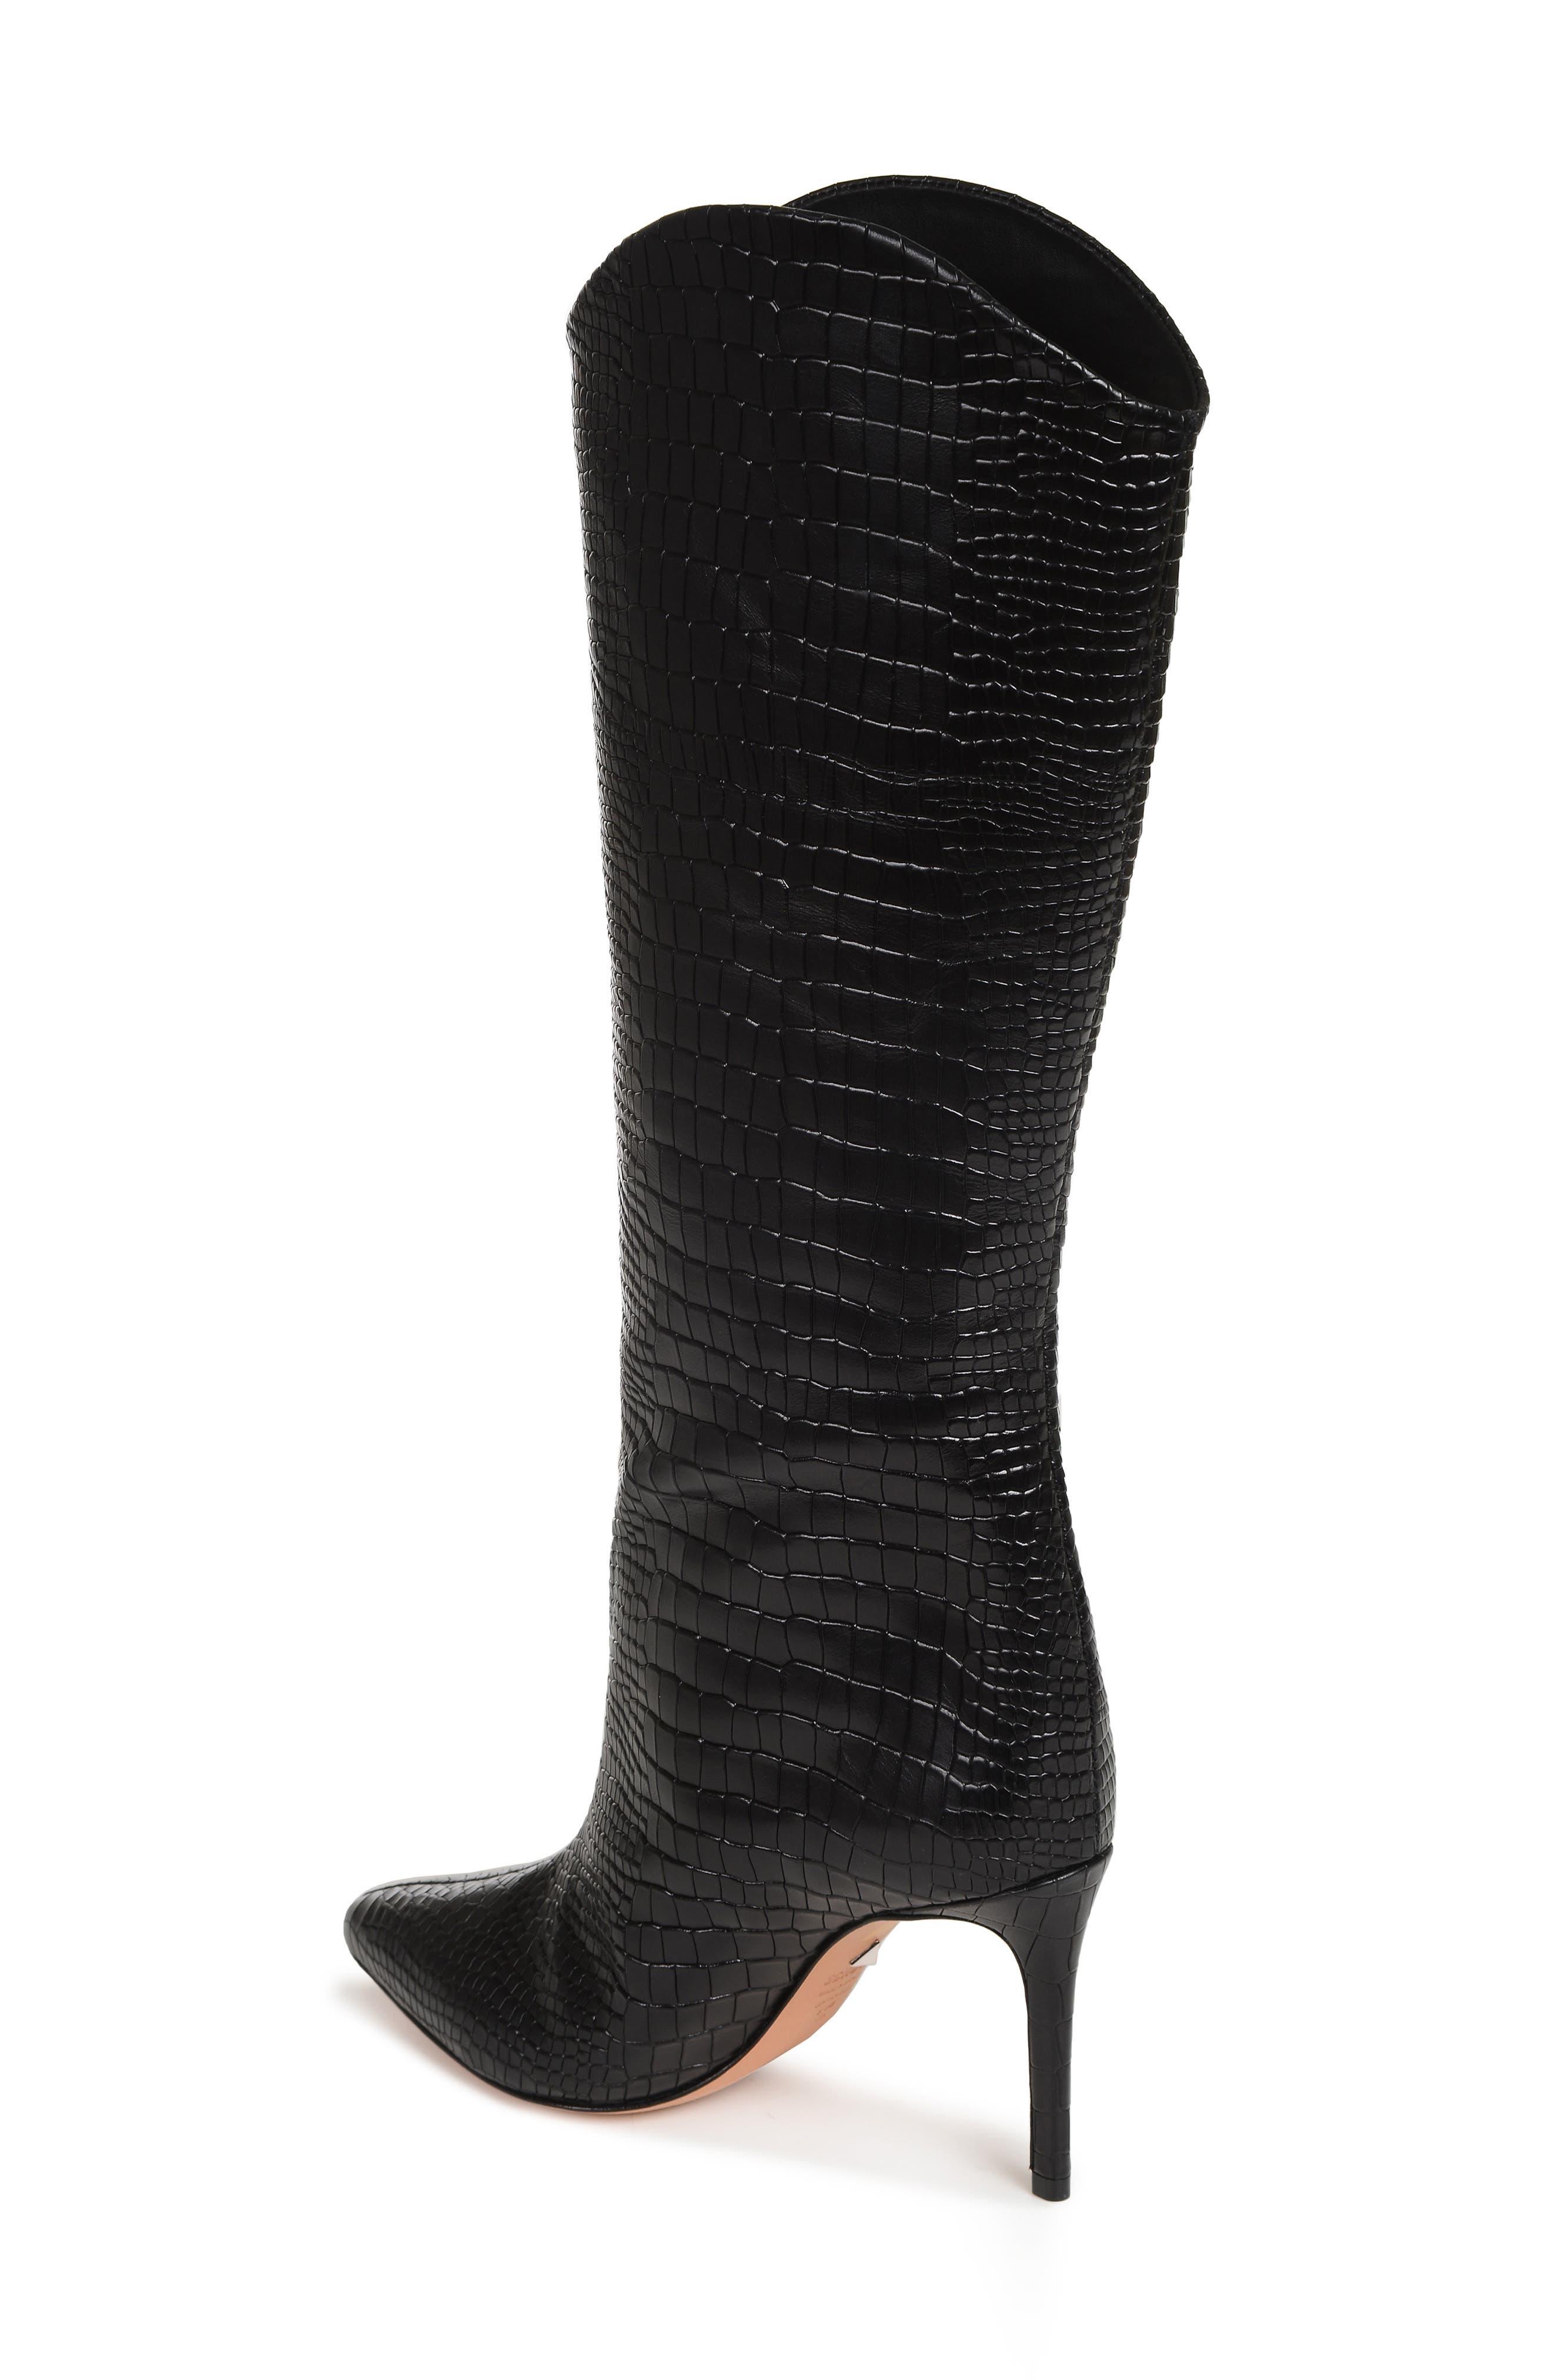 SCHUTZ, Maryana Pointy Toe Boot, Alternate thumbnail 2, color, BLACK LEATHER